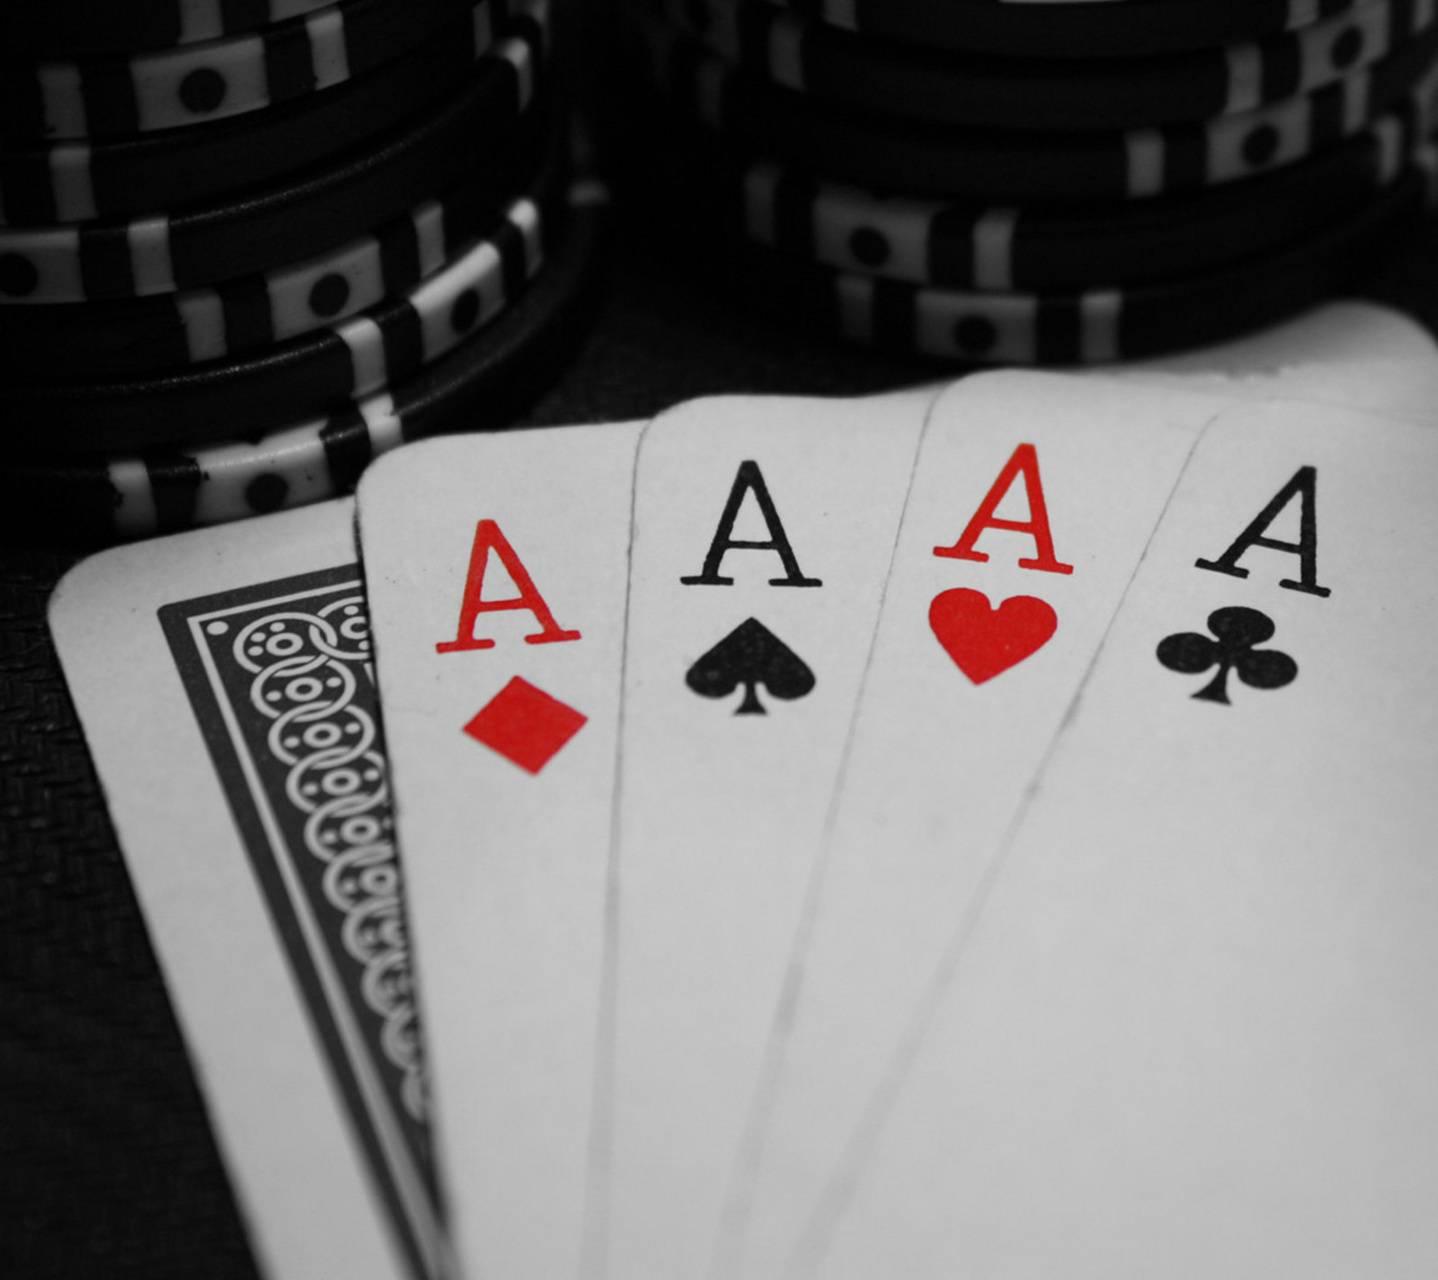 4 Aces Poker